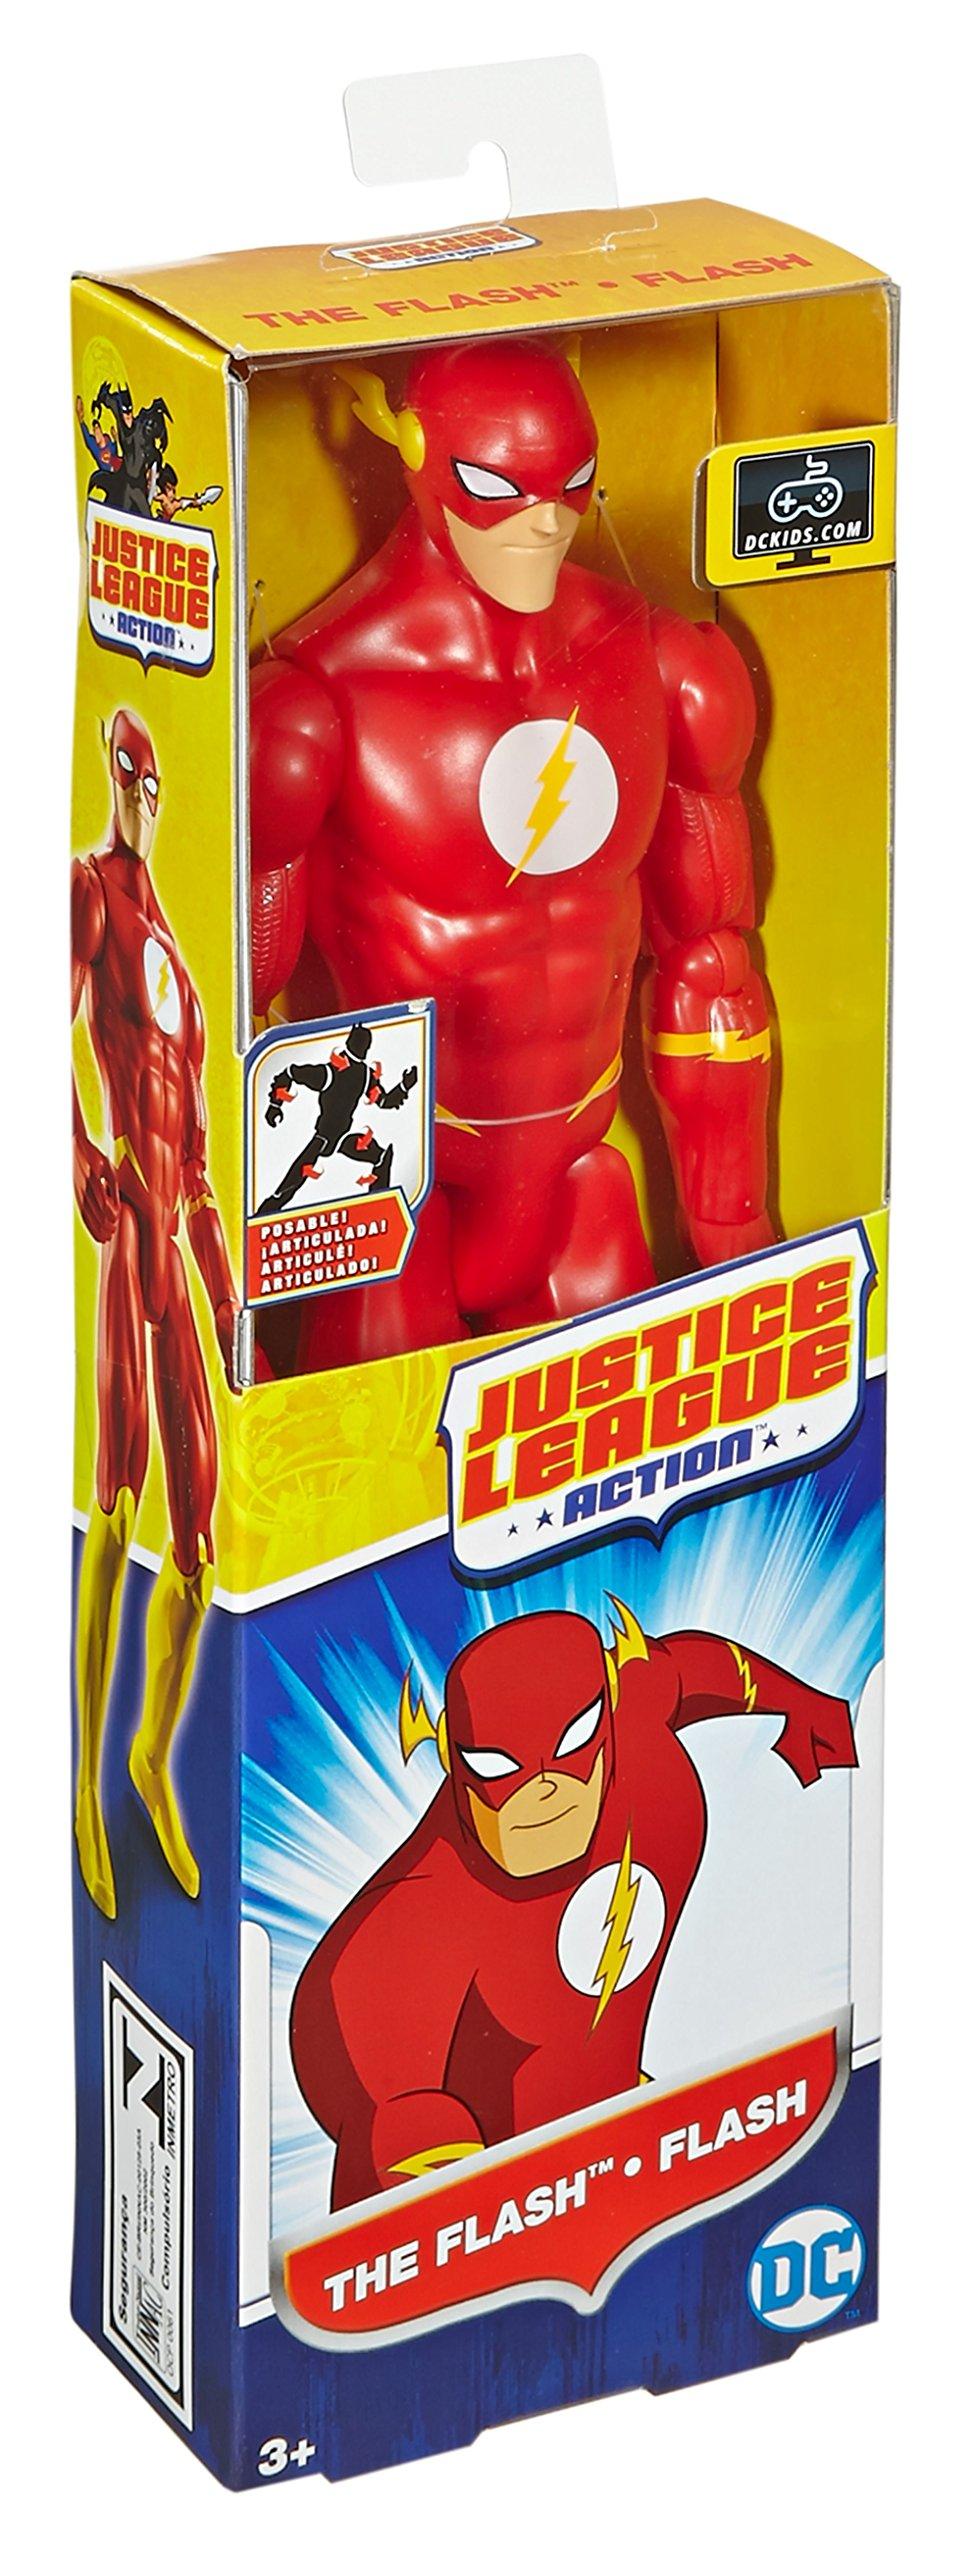 Justice League Action The Flash Figure, 12'' by Mattel (Image #5)